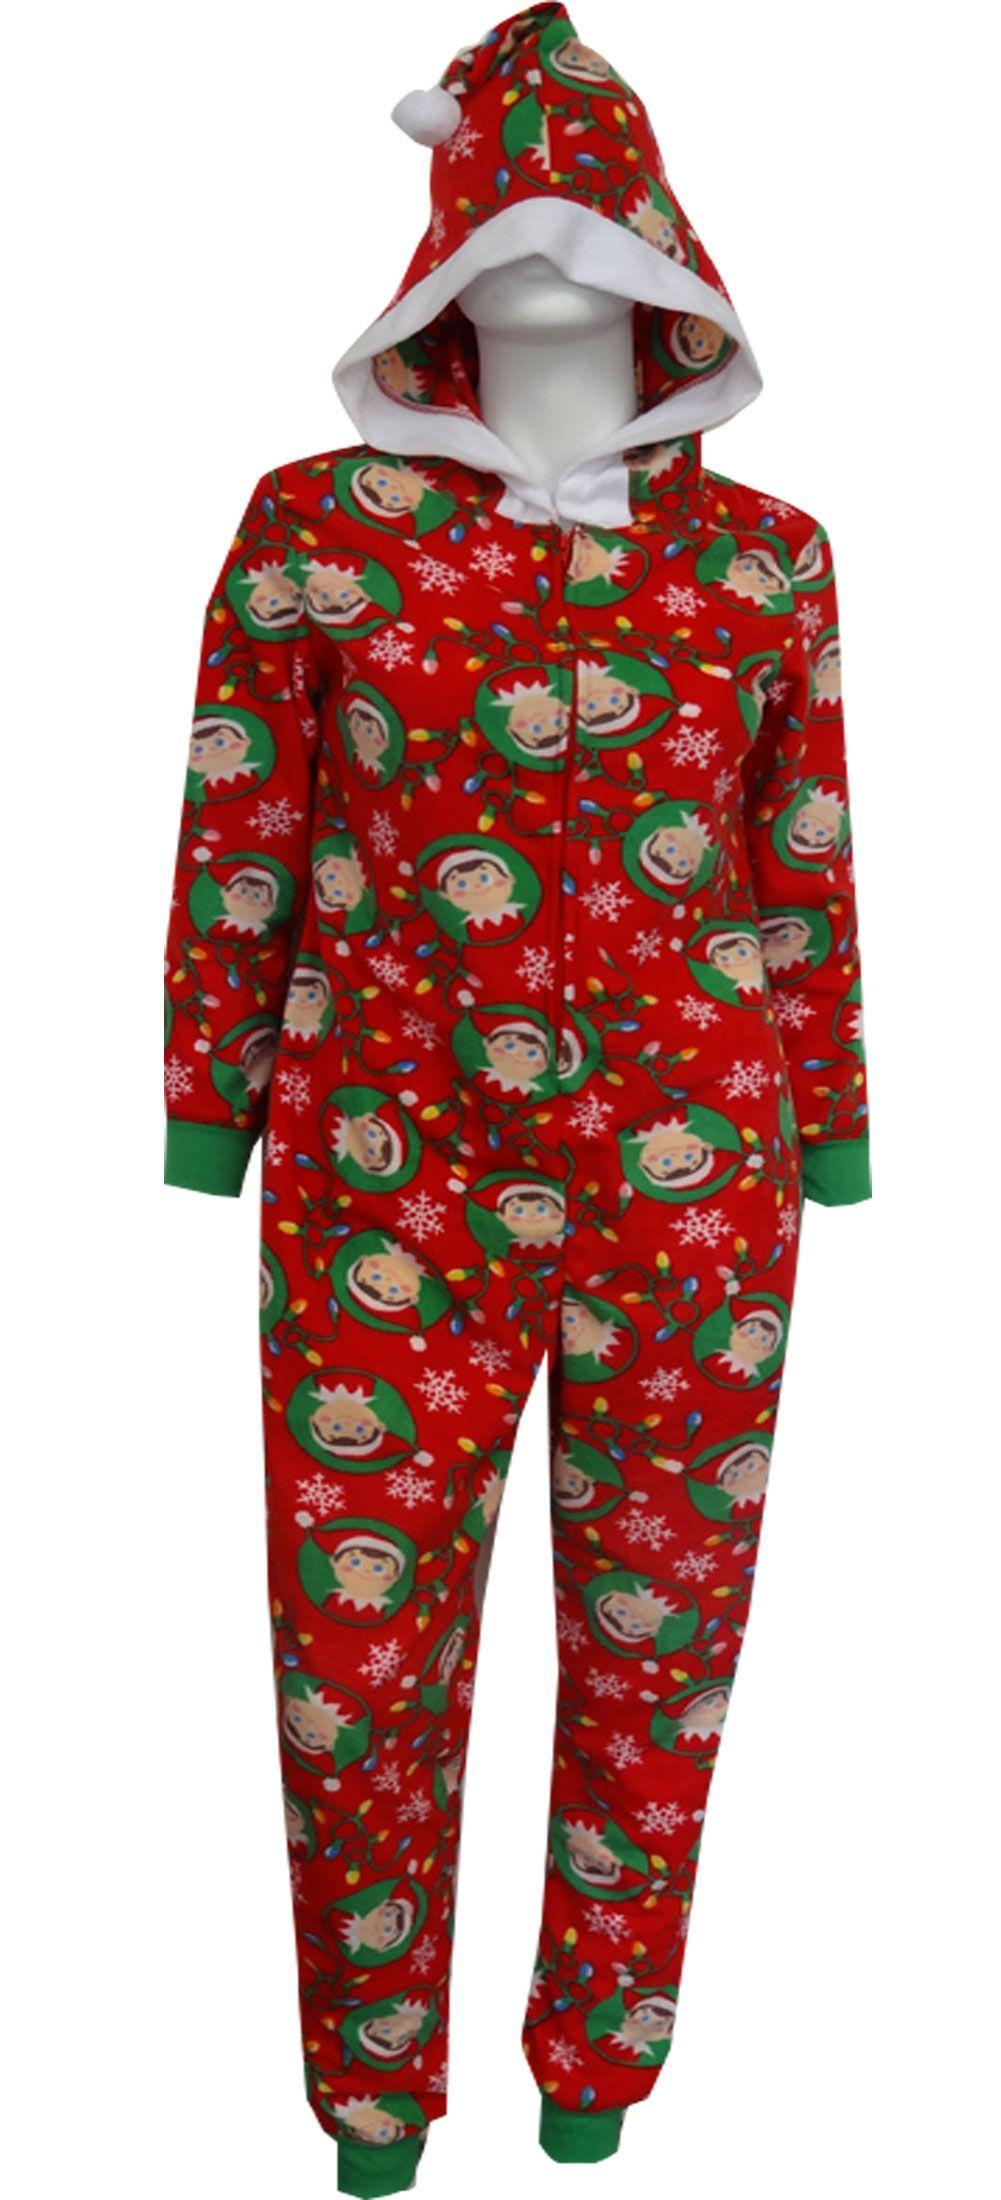 69b4733521 WebUndies.com Christmas is Coming Elf on the Shelf Onesie Adult Pajama